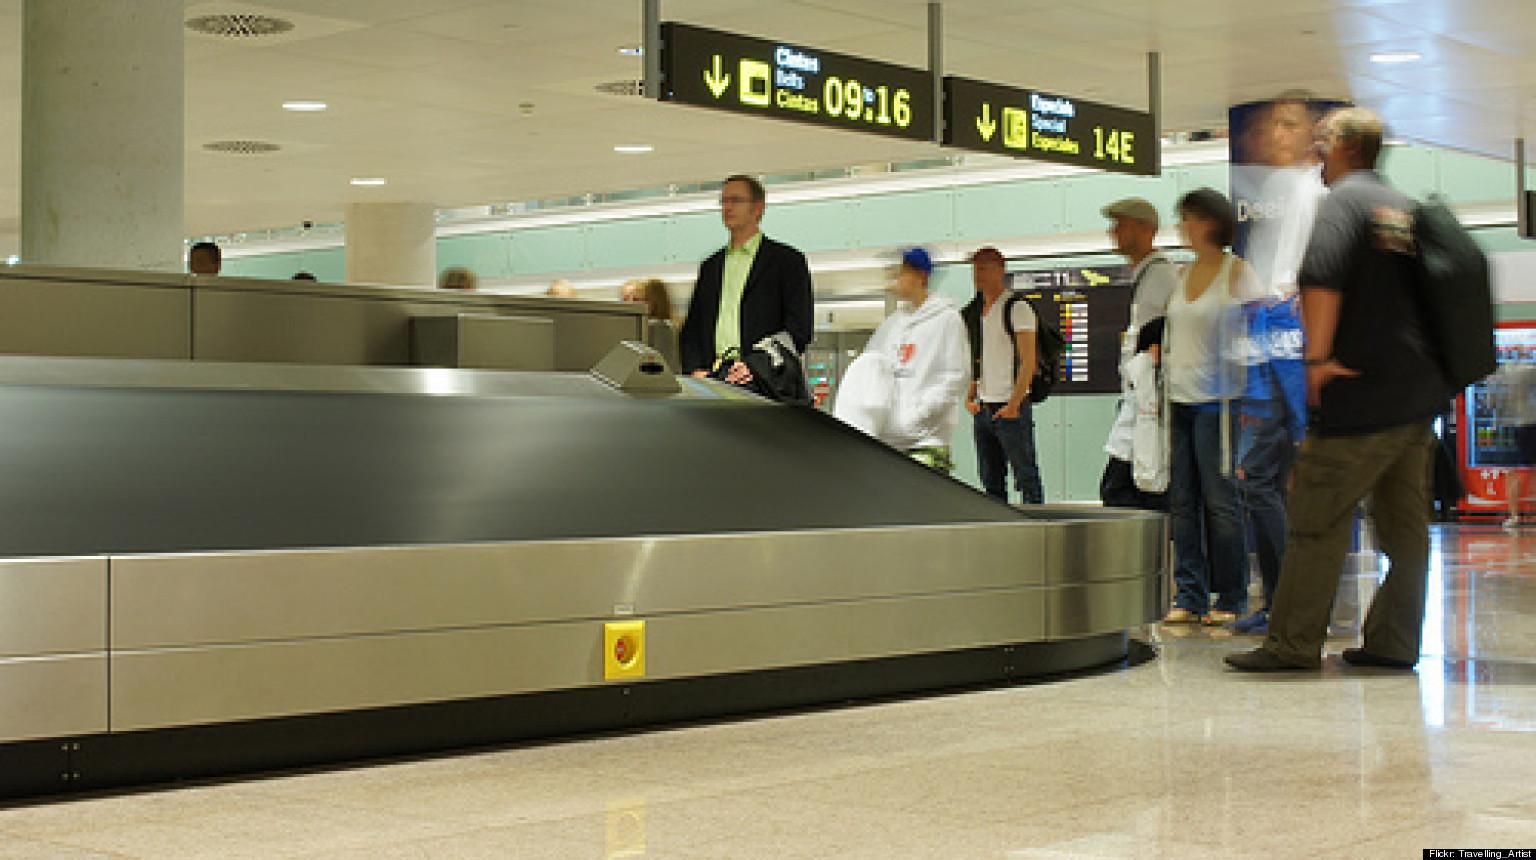 7 ways to prevent lost luggage smartertravel. Black Bedroom Furniture Sets. Home Design Ideas